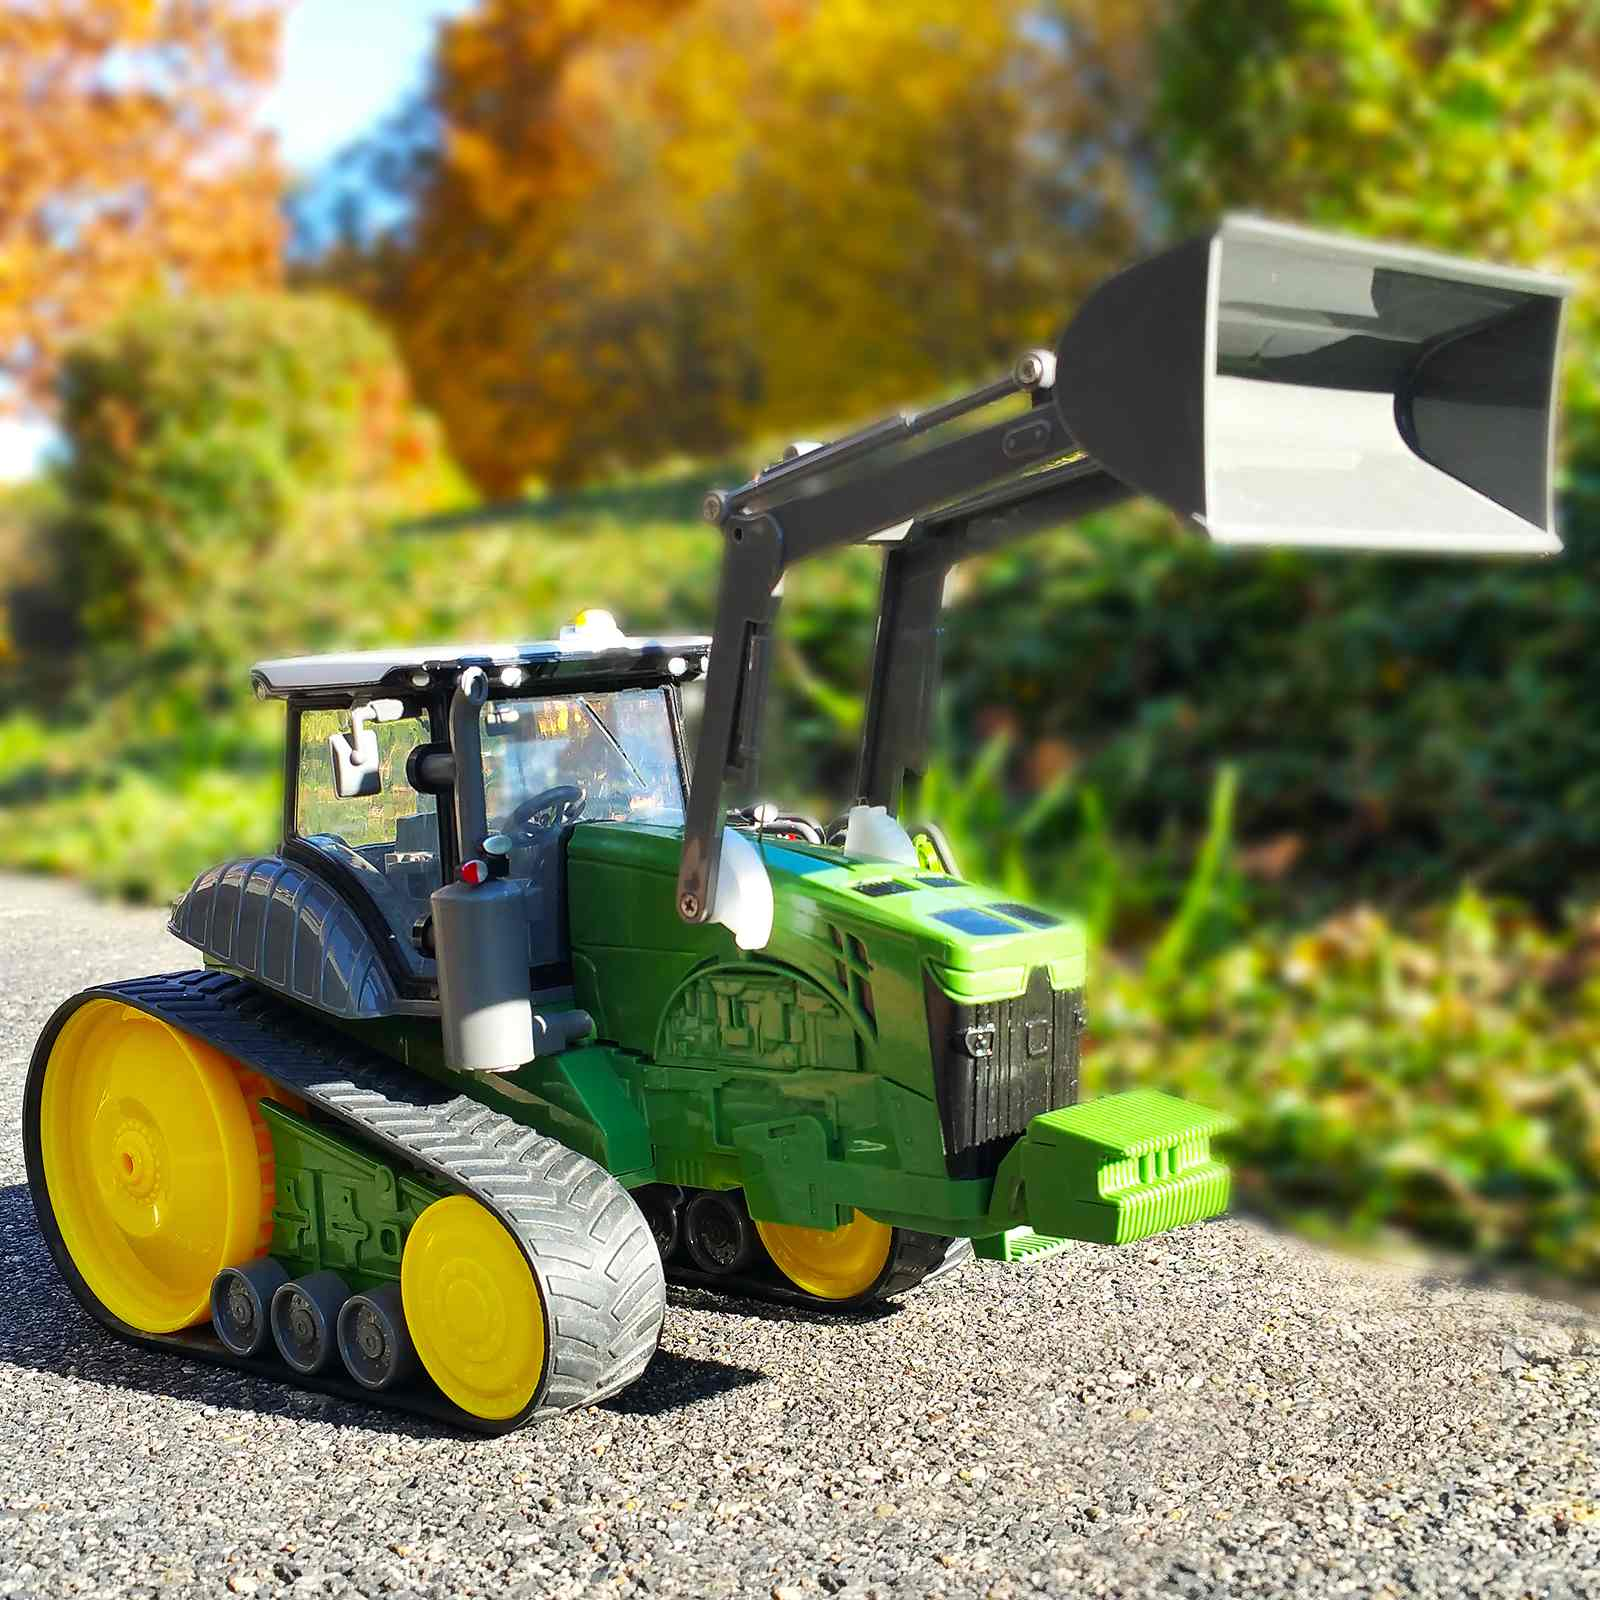 Rc ferngesteuerte kettenfahrzeug kinder spielzeug traktor